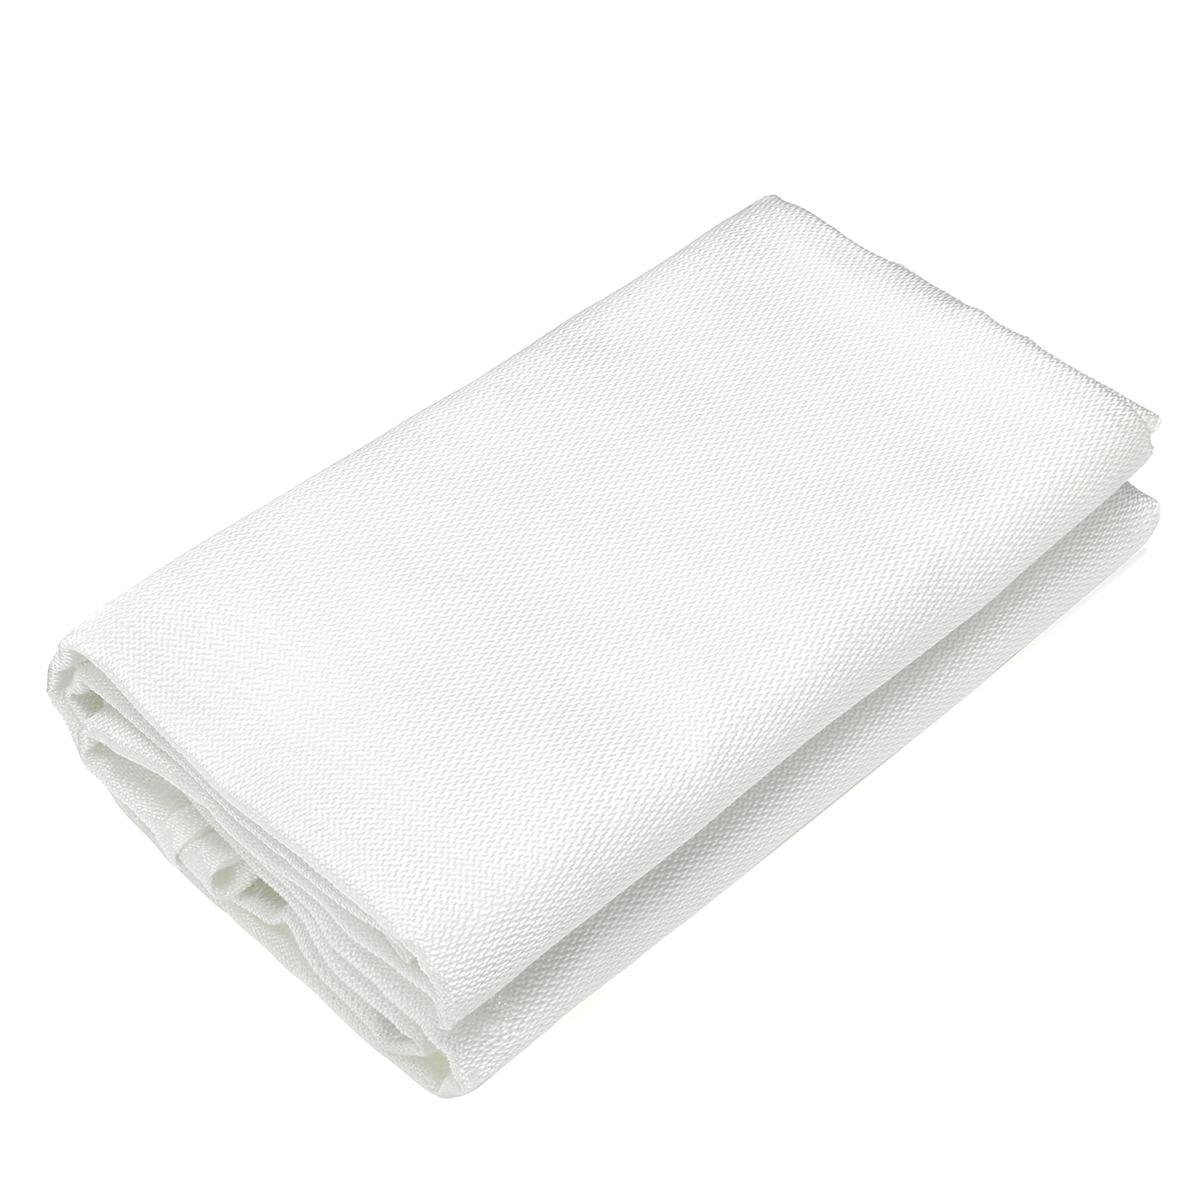 1 8m X1 2m Welding Blanket Fire Flame Retardant Fiberglass